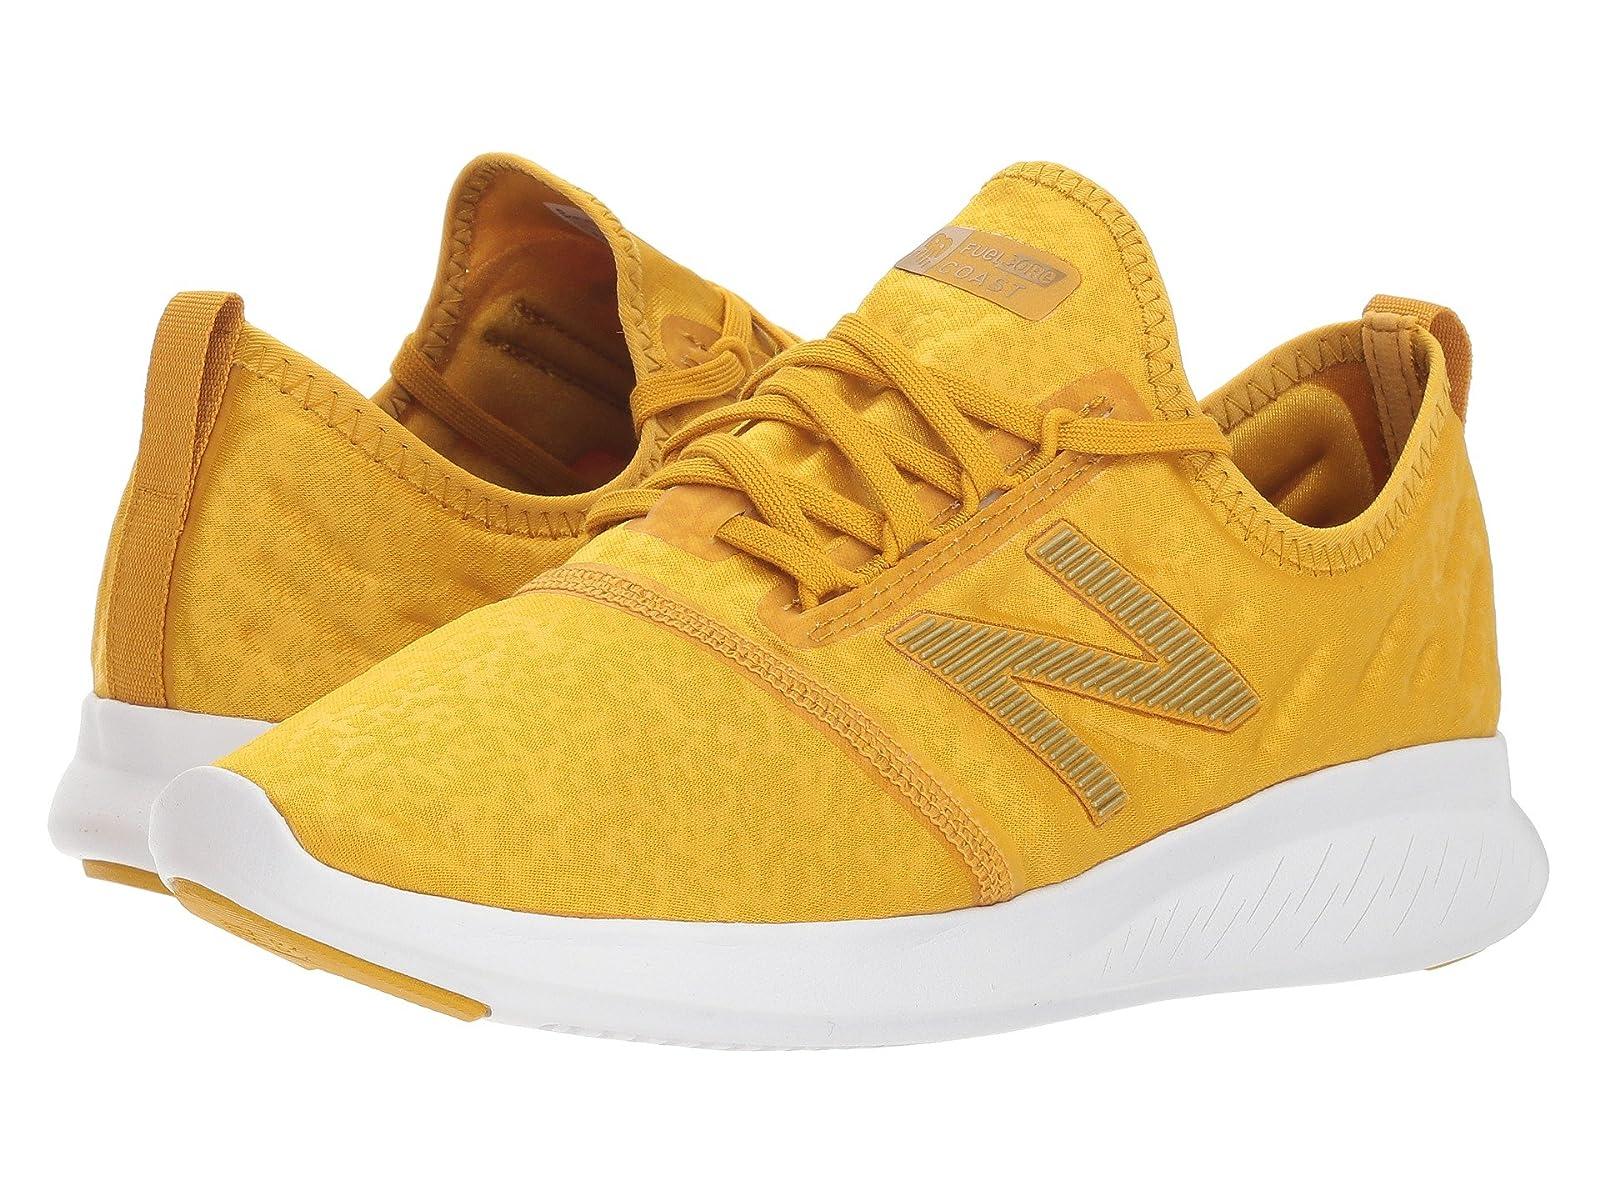 New Balance Coast v4 Digi CamoAtmospheric grades have affordable shoes